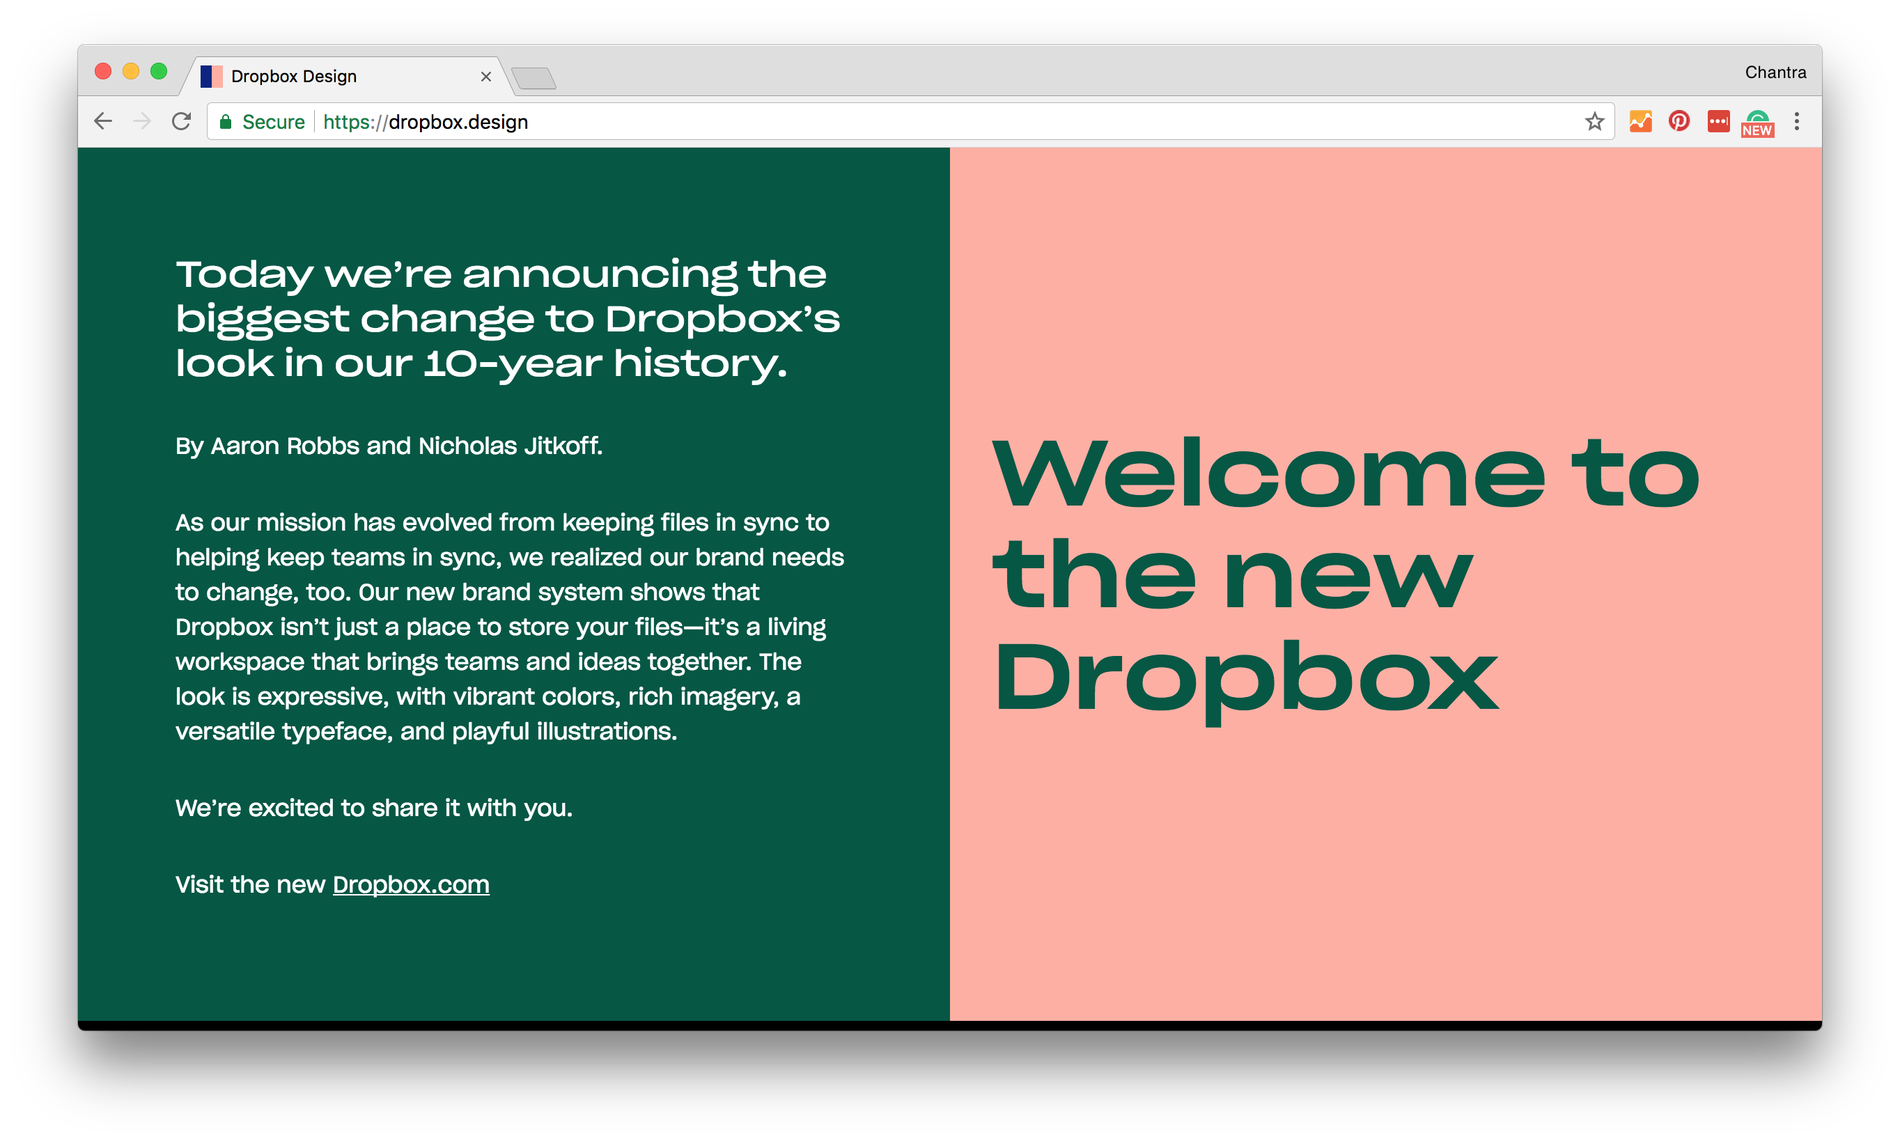 Sharp-Grotesk-Dropbox-Design-Web-5